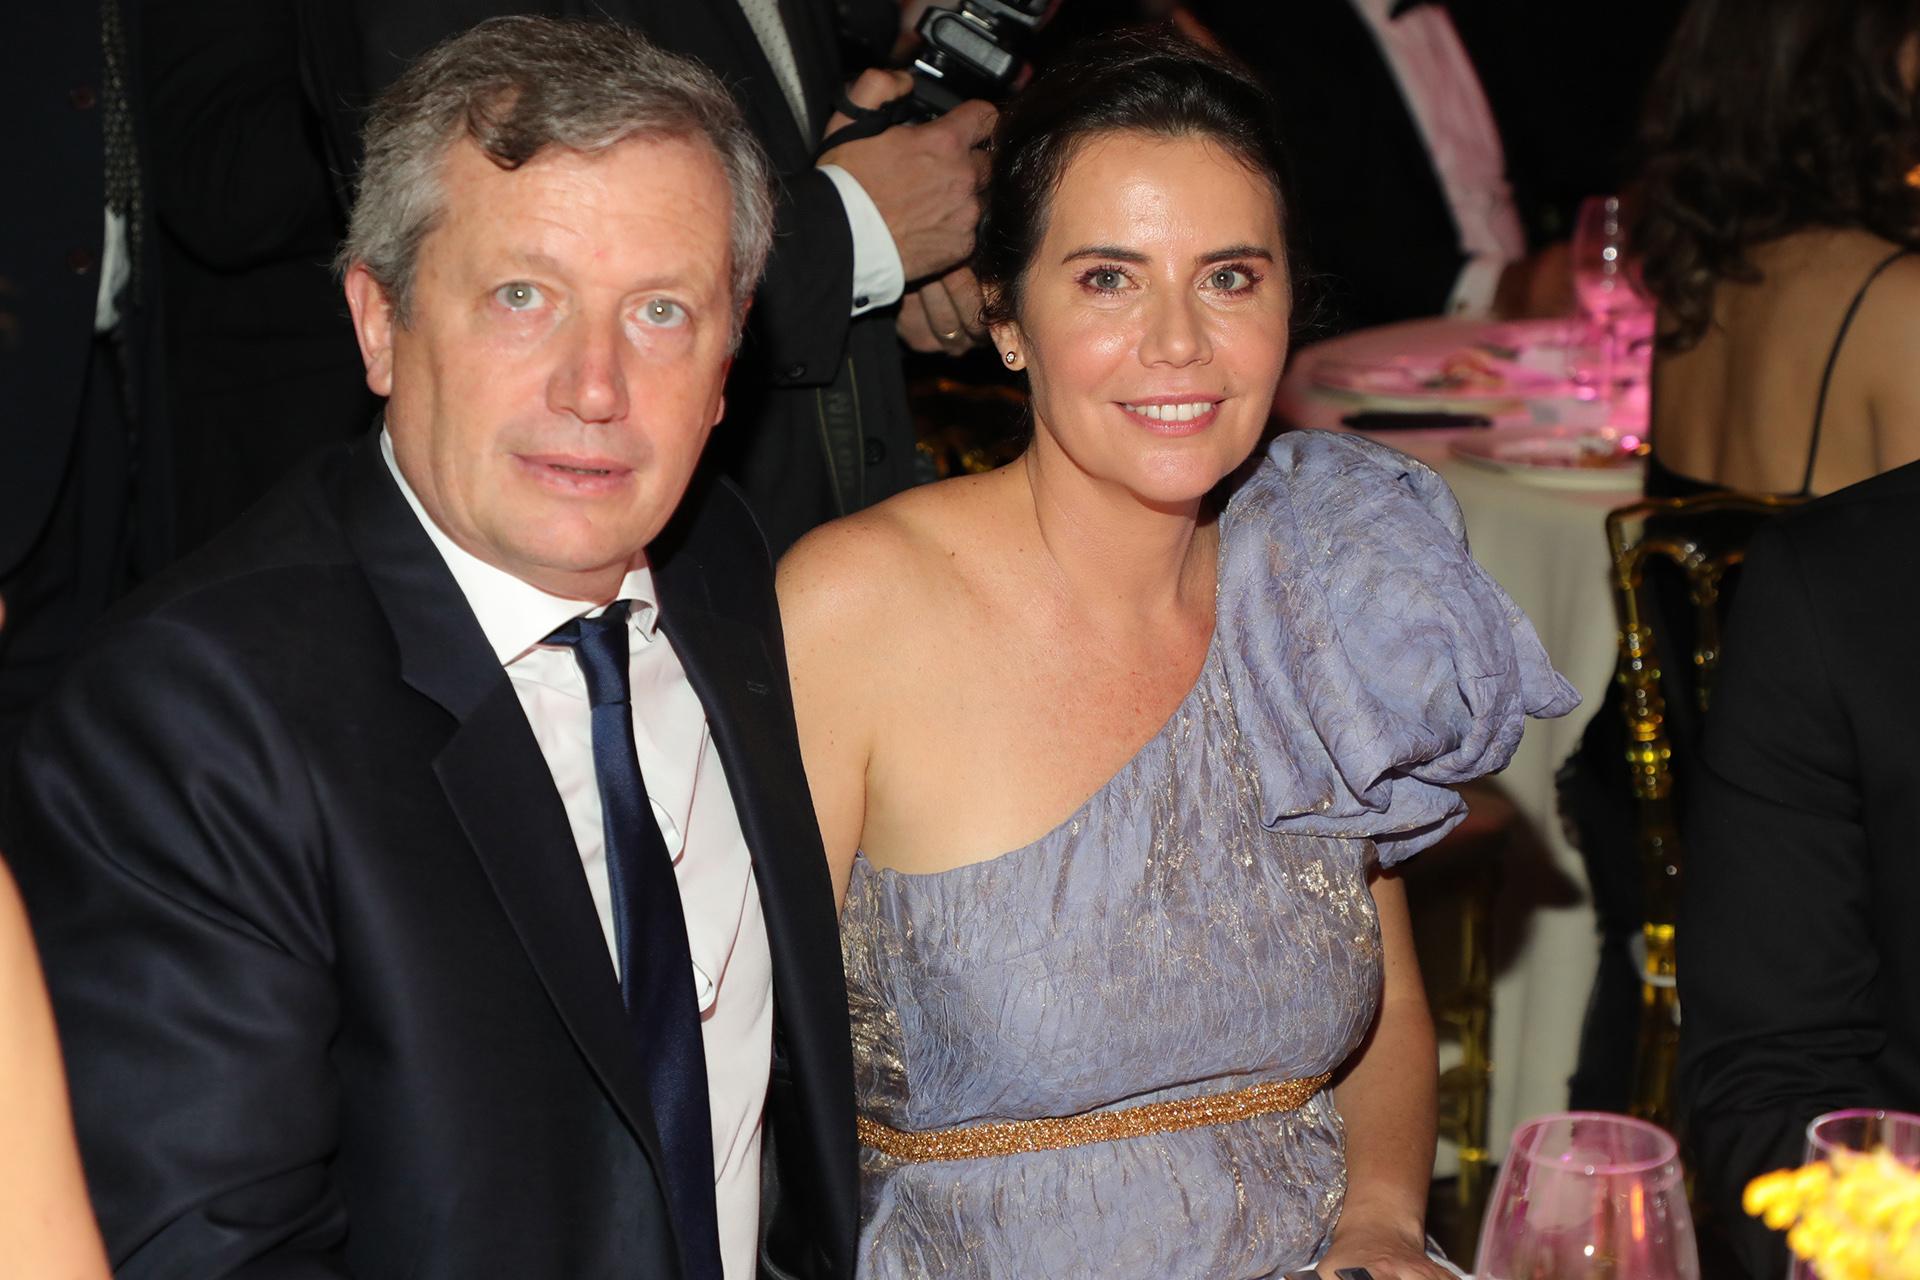 Emilio Monzó y su mujer Karen Sánchez